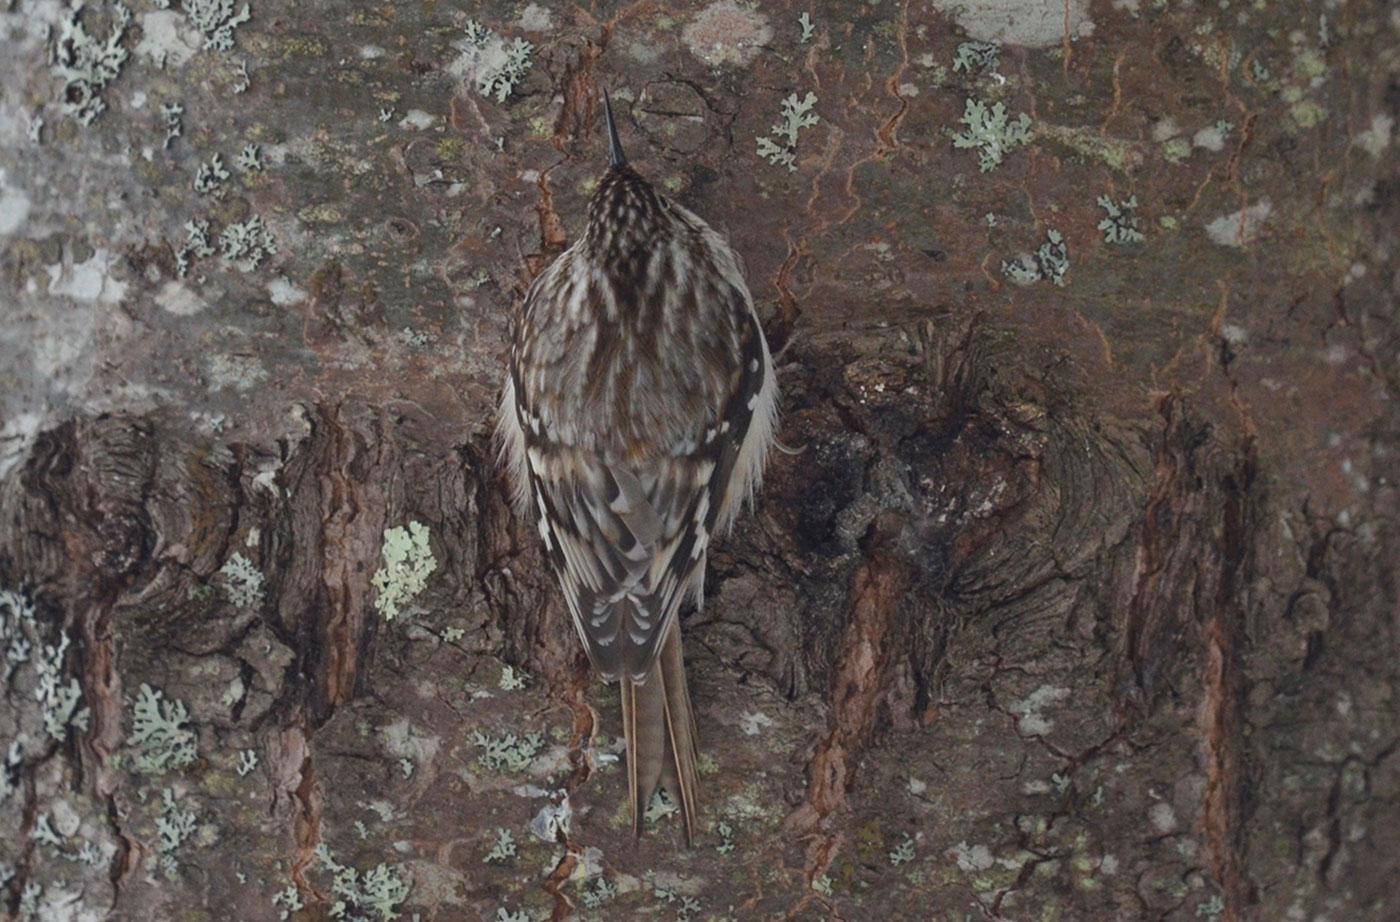 Brown Creeper by Callie Wronker